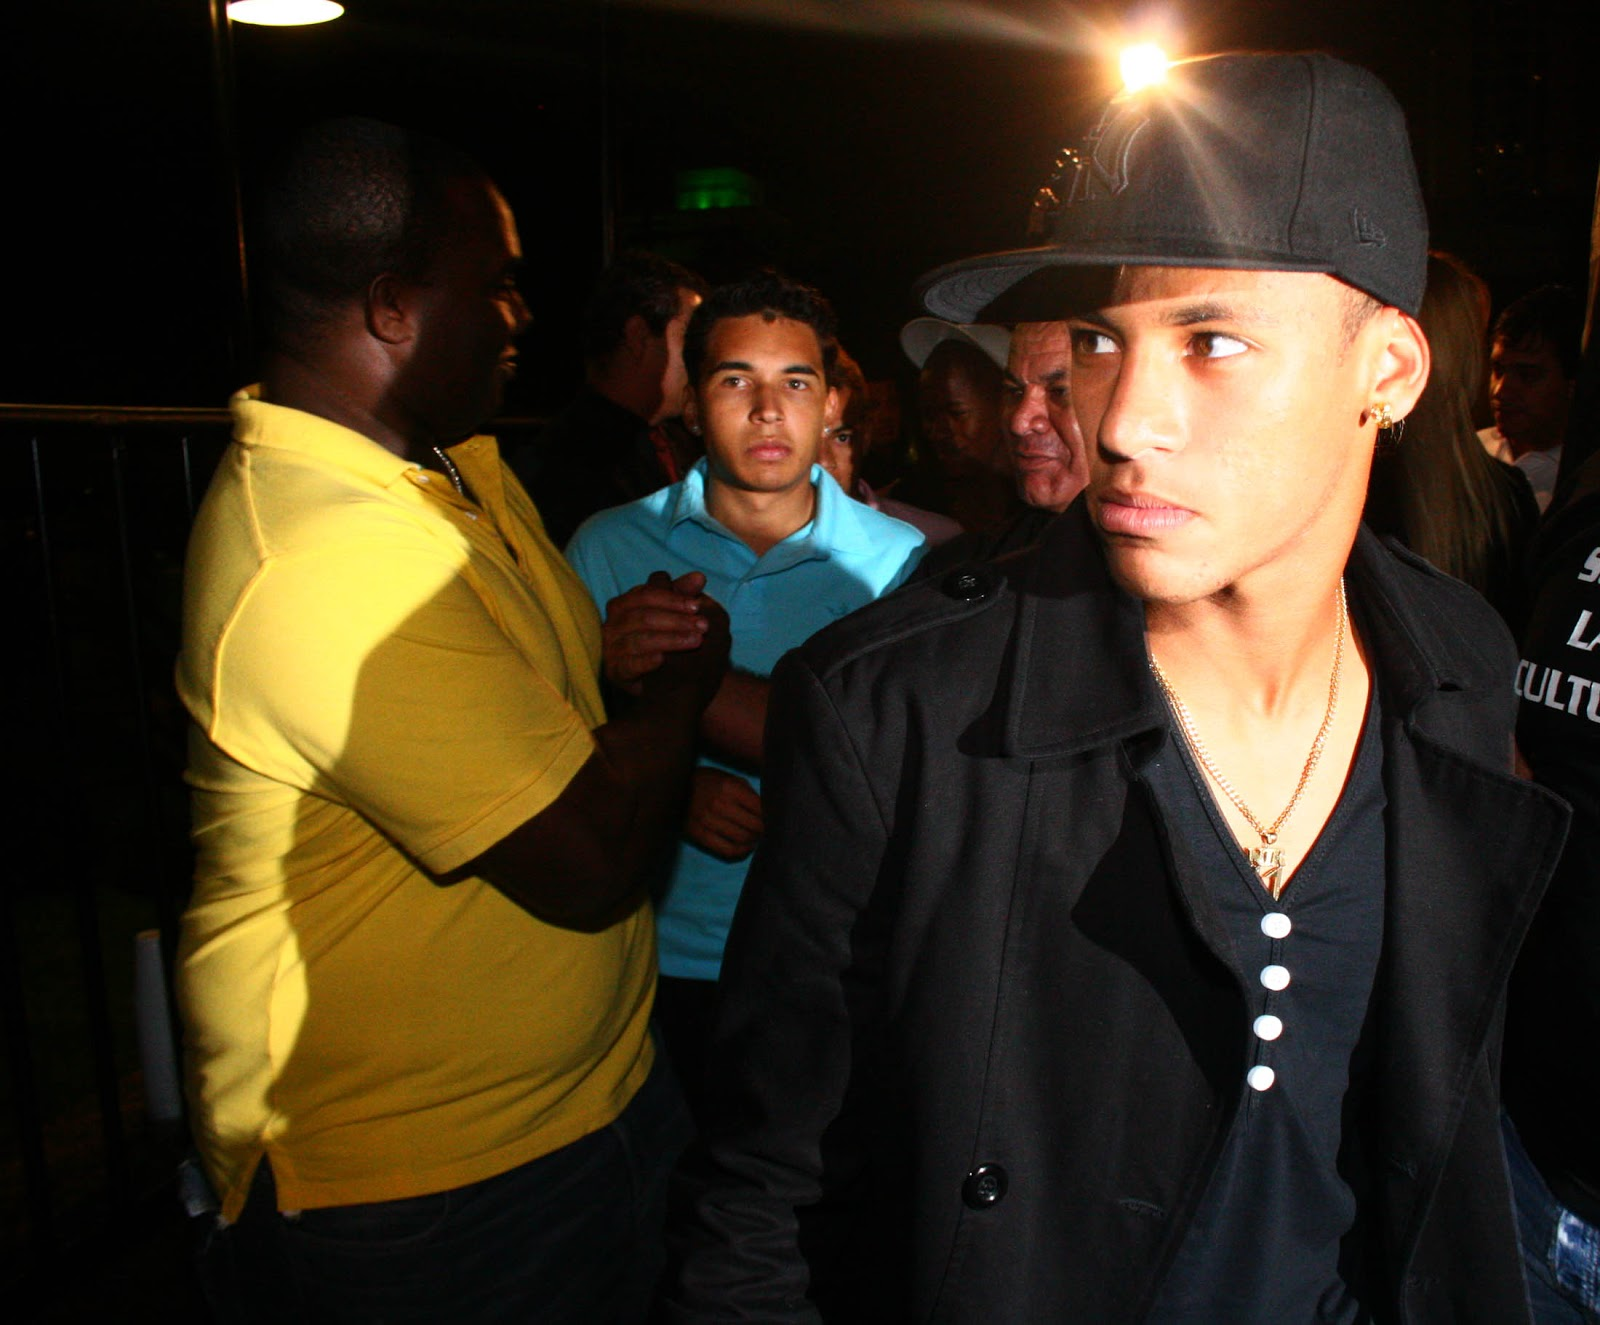 http://3.bp.blogspot.com/-lkAMtjPH1qg/UTsvXqcX2bI/AAAAAAAABfE/U3tVFG7mWI8/s1600/Neymar%2BDisco%2BParty%2BWallpaper.jpg